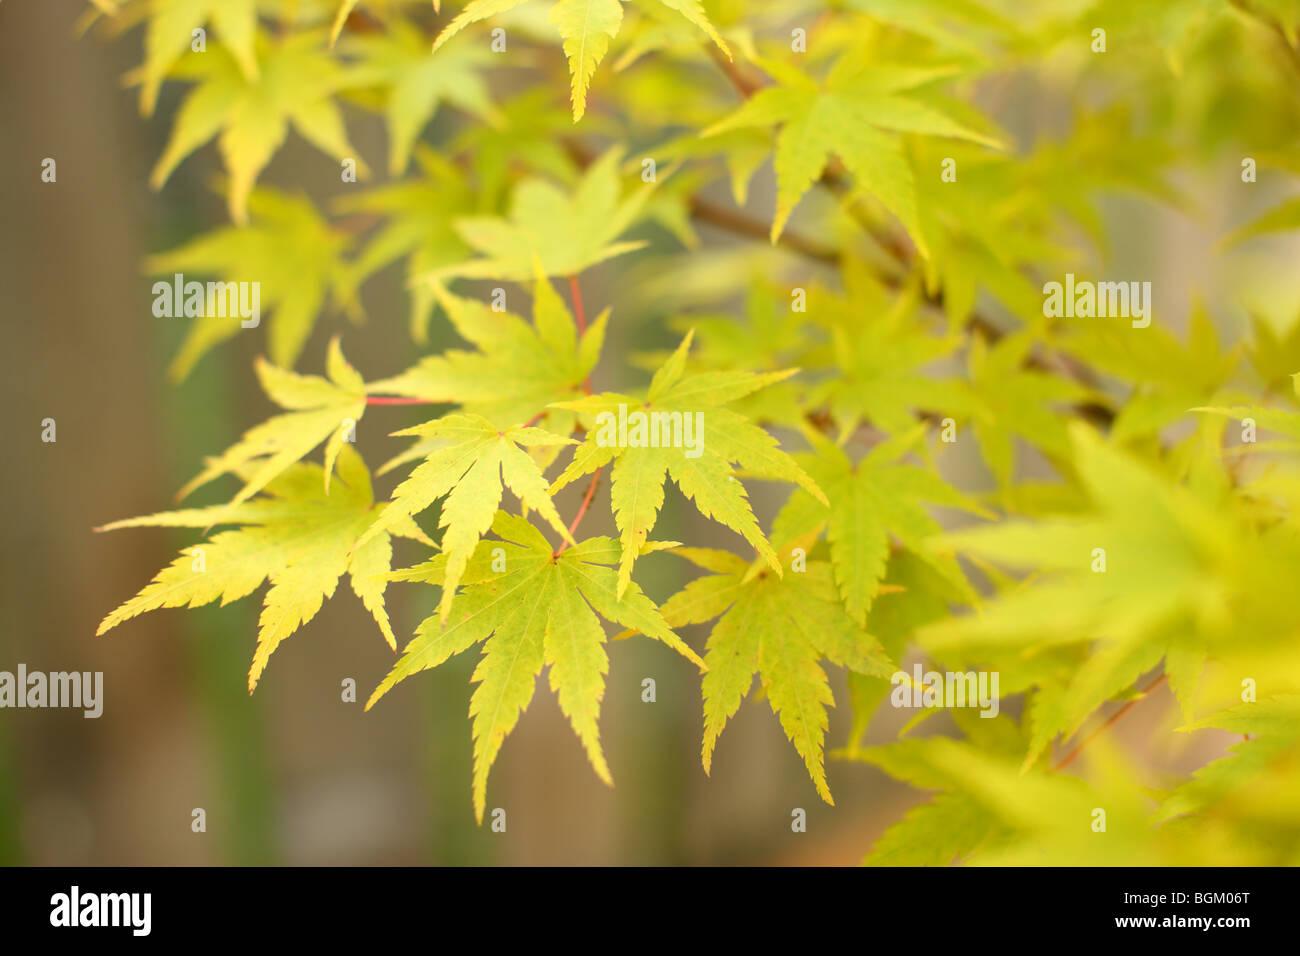 Gelber japanischer Ahorn-Blätter Stockbild